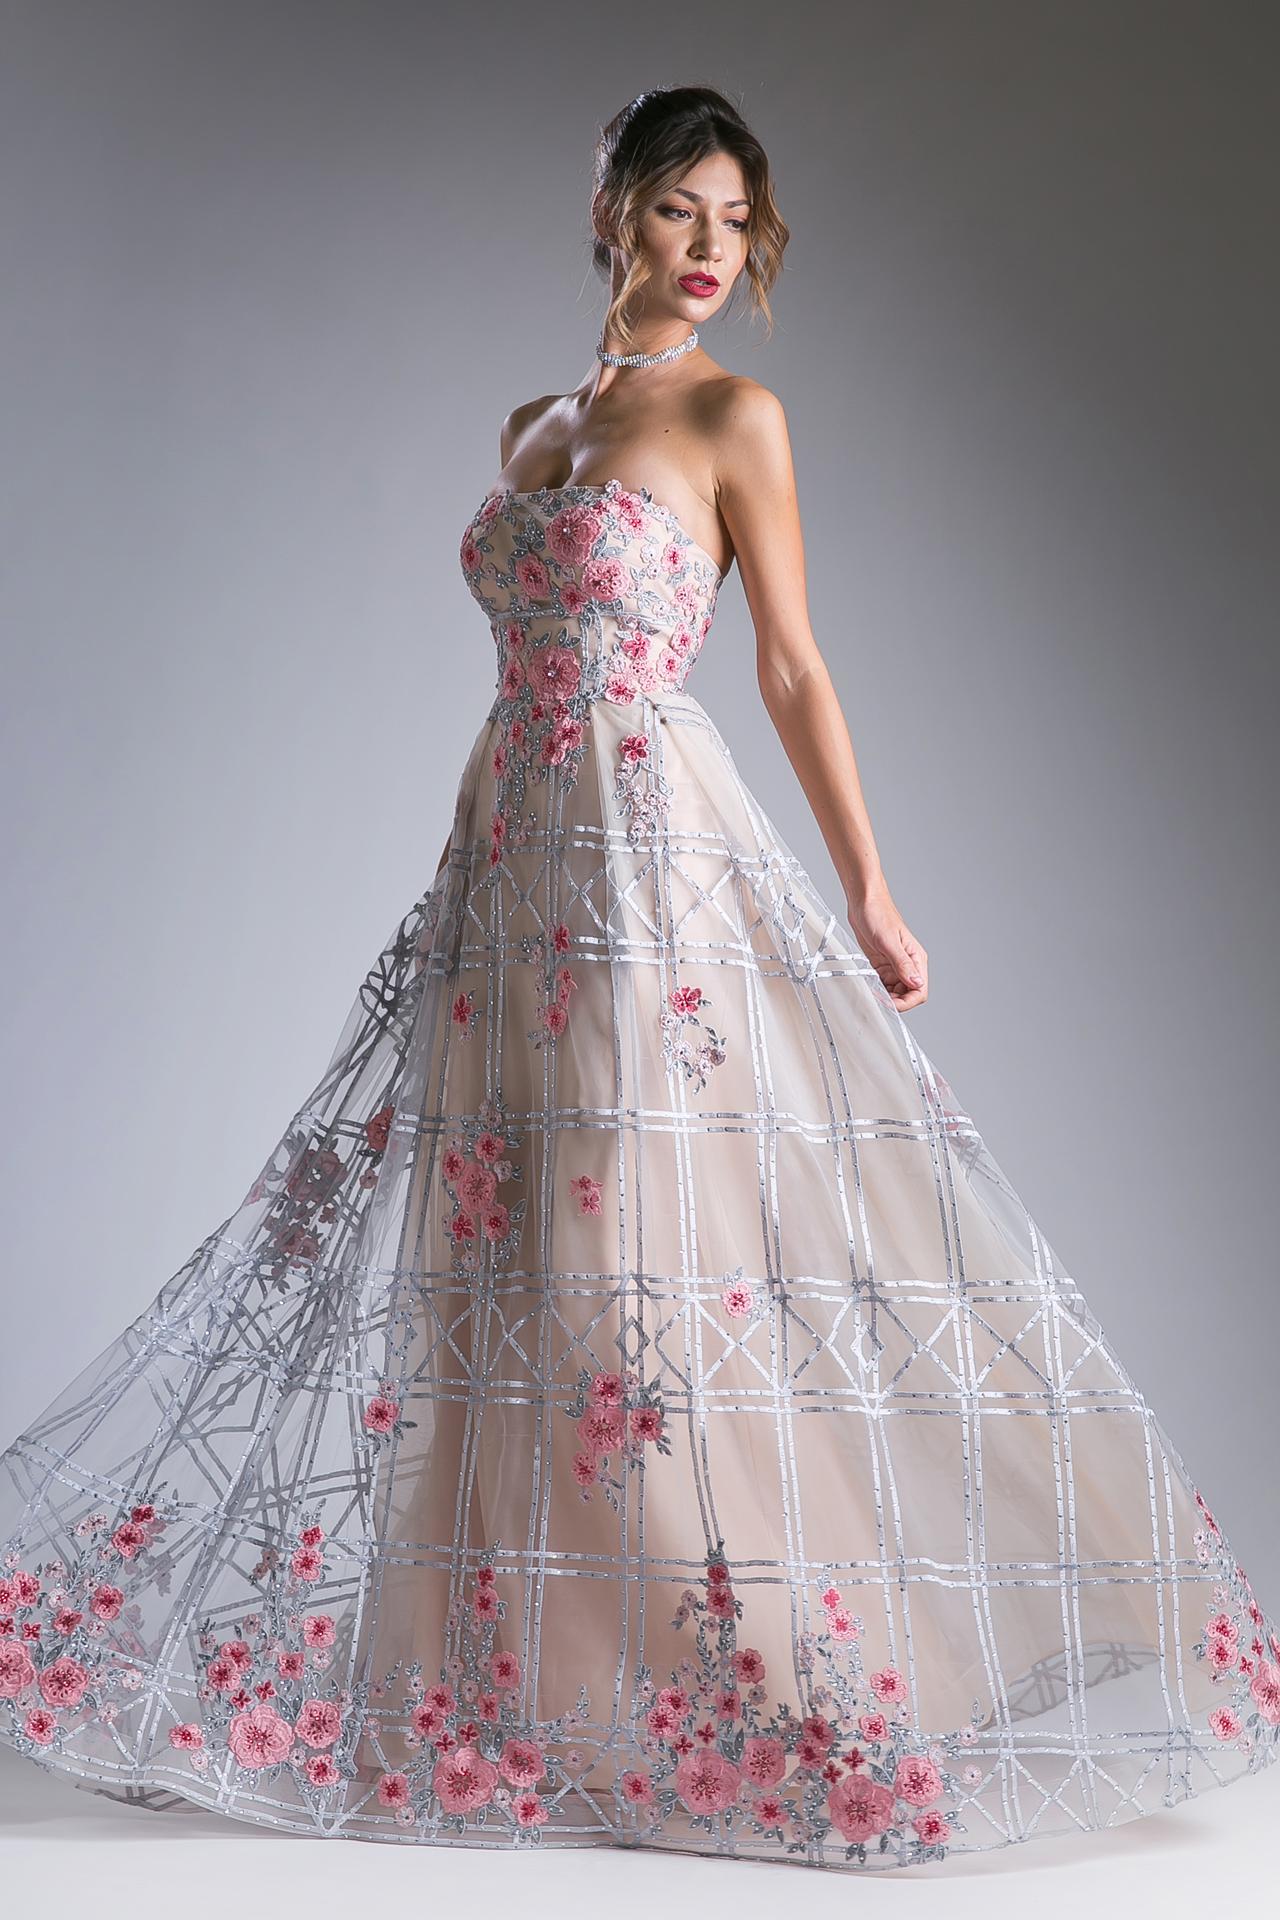 Nové spoločenské šaty :) - Obrázok č. 9